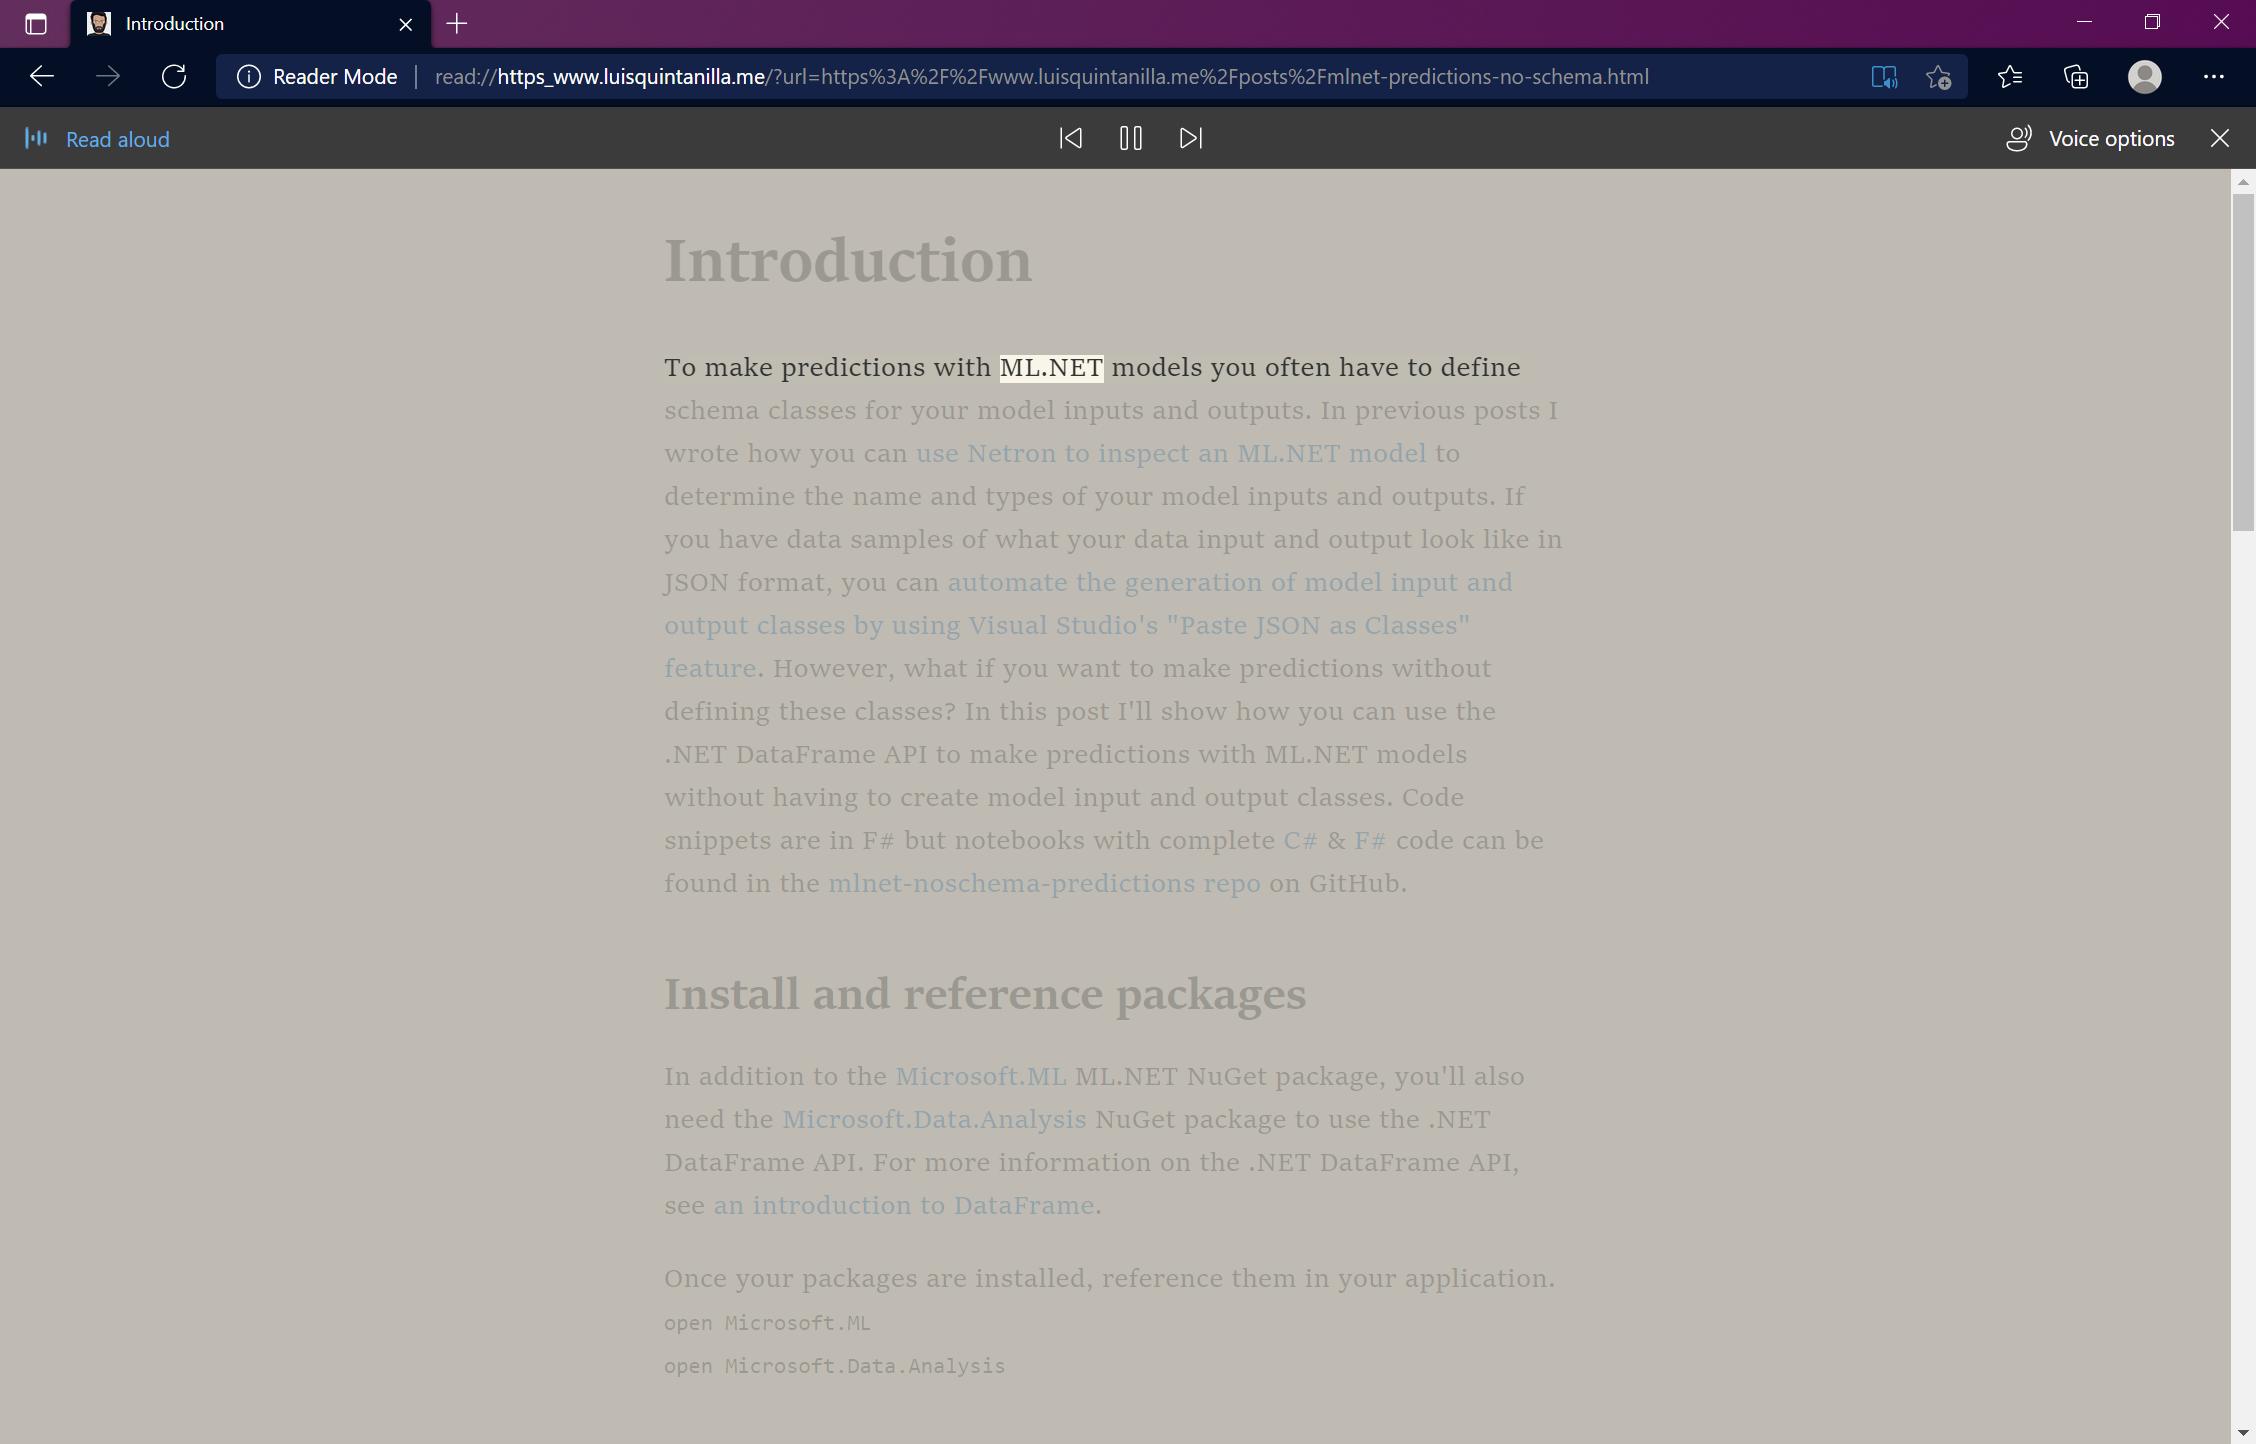 Microsoft Edge Immersive Reader read aloud reading blog post